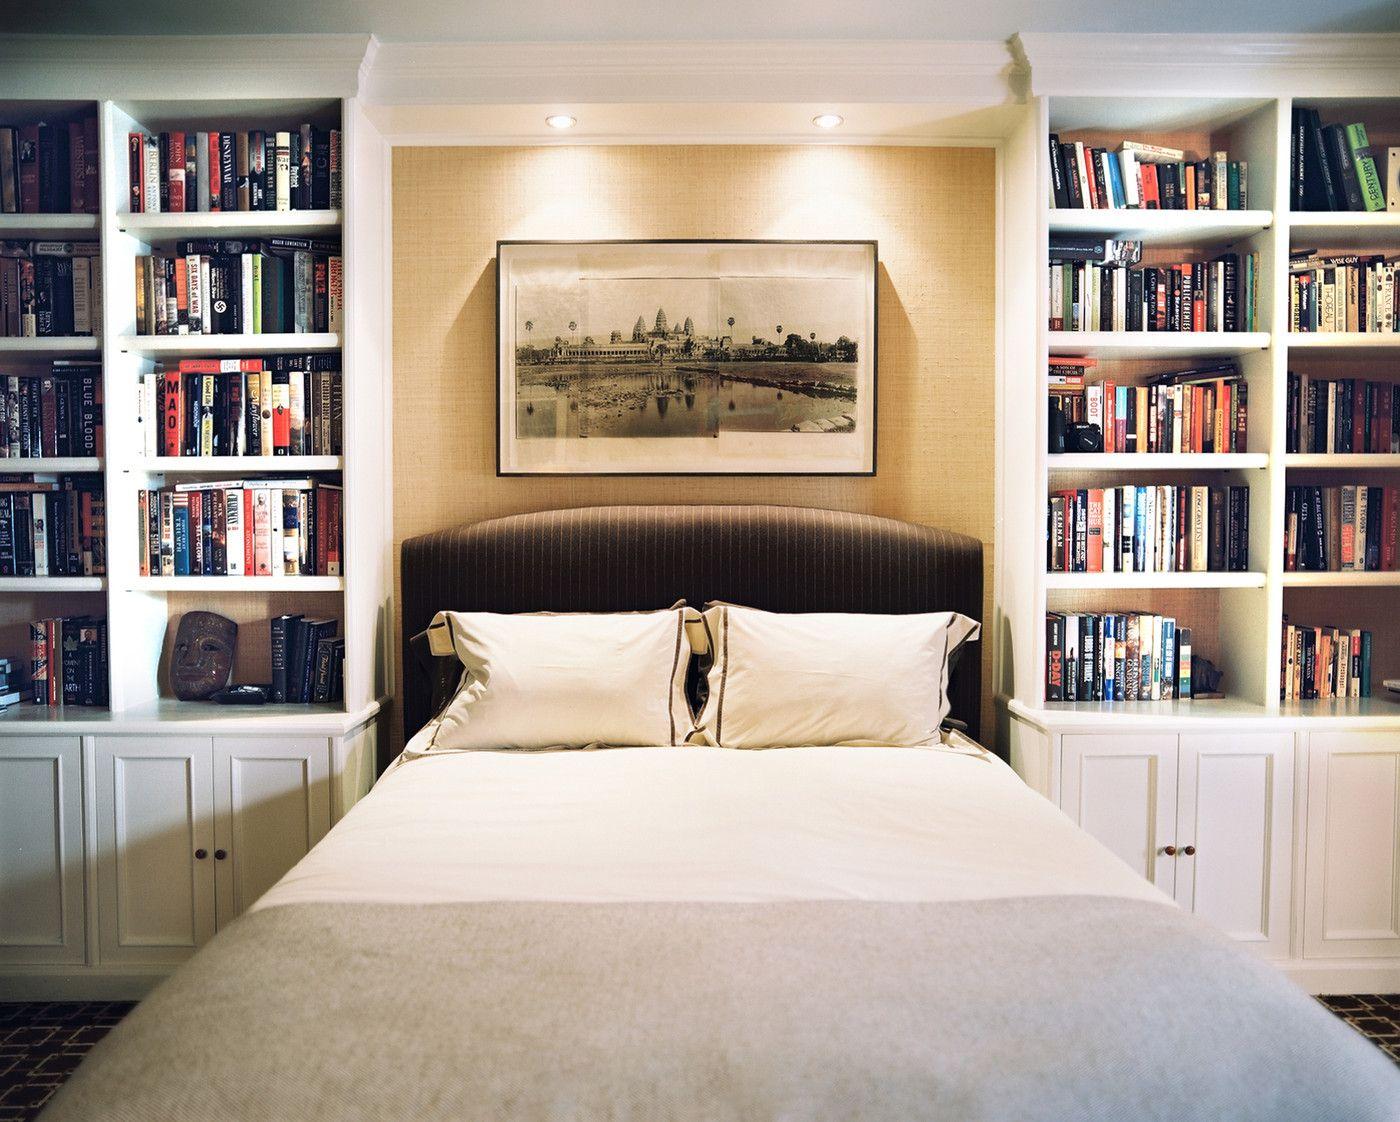 Pin di ranjana nag su book racks for small spaces | Pinterest